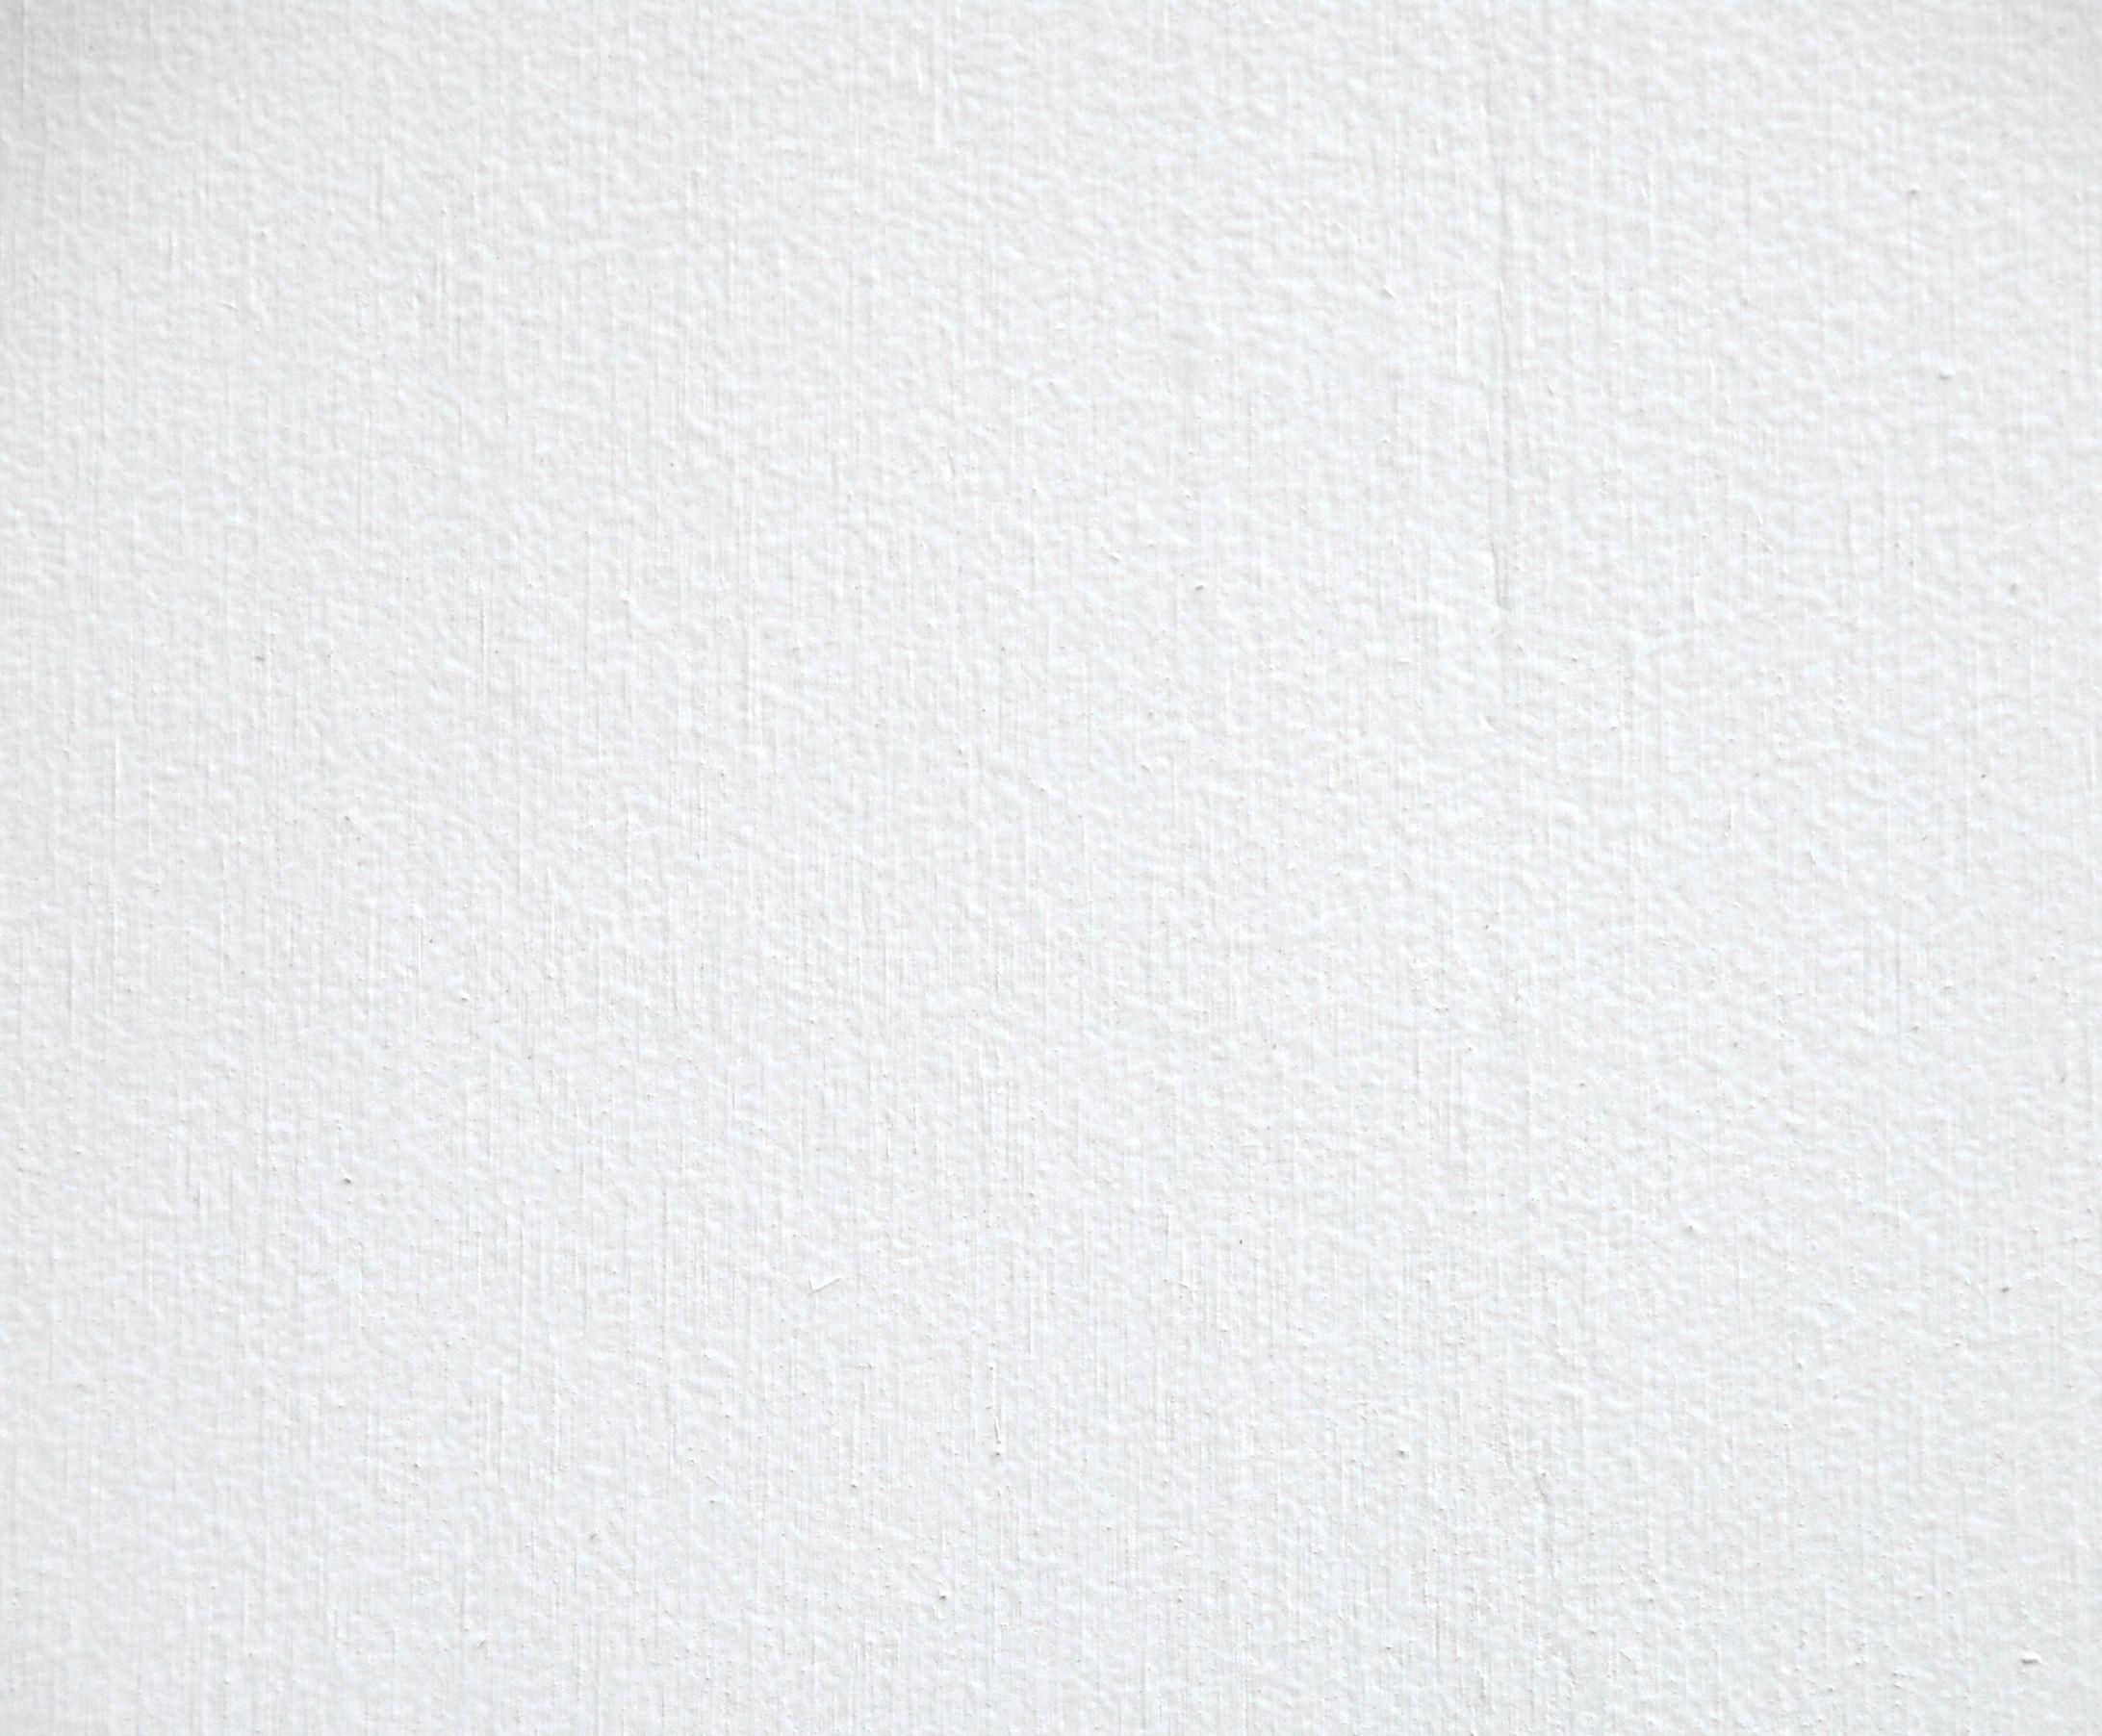 White Painted Concrete Floors Floors Pinterest Painted Concrete Floors Paint Concrete And